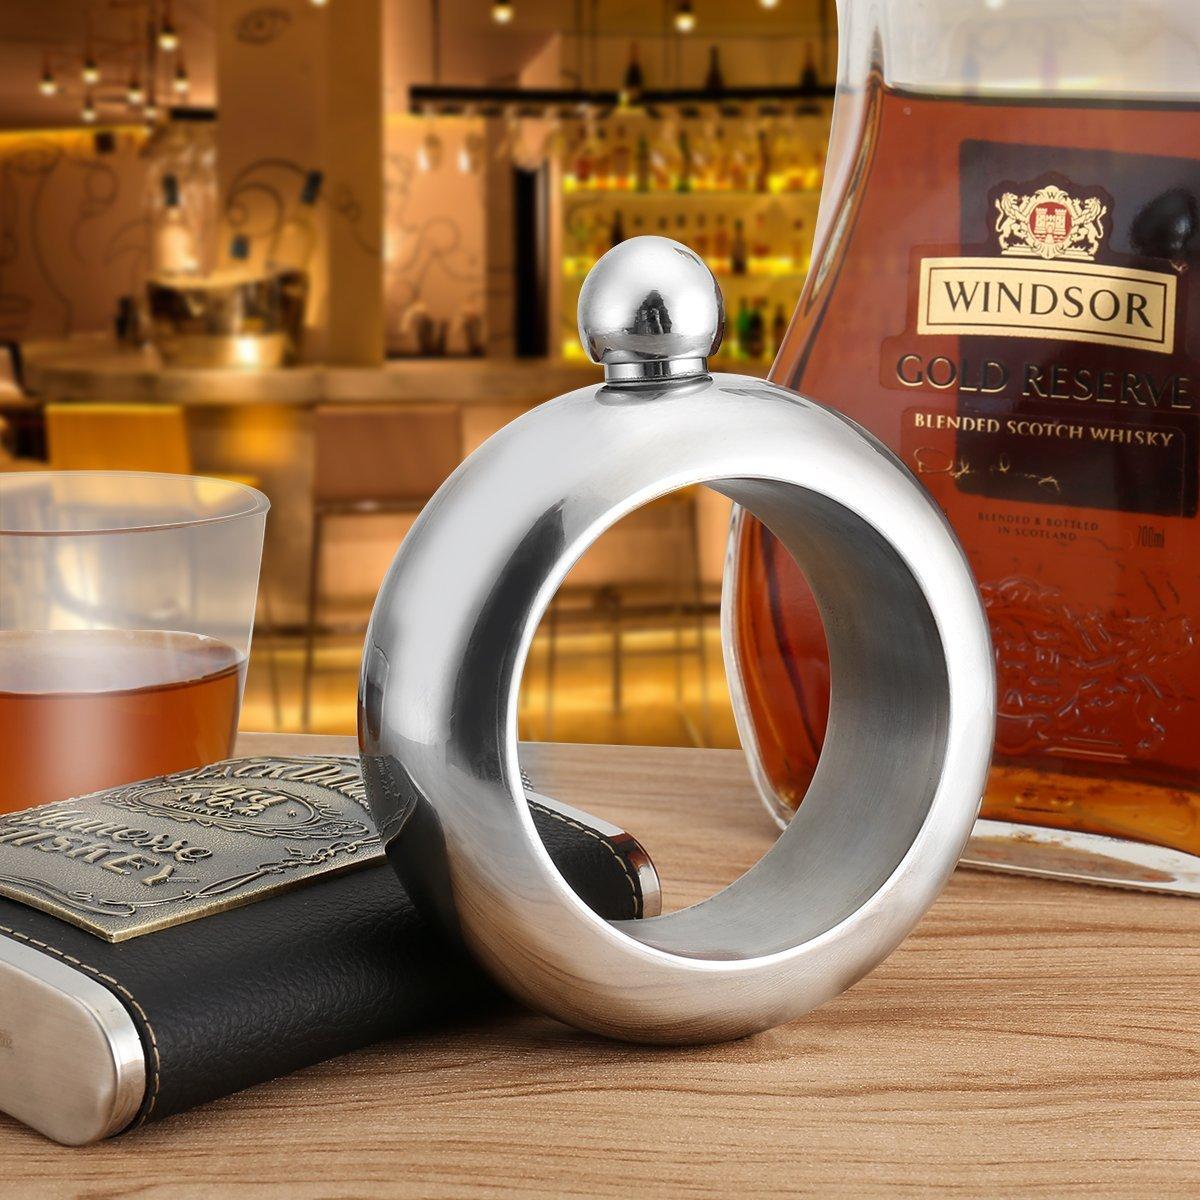 Bracelet Flask with Funnel,Creative Hidden Stainless Steel Bracelet Flask for Storing Whiskey/Alcohol 3.5oz (Silver)